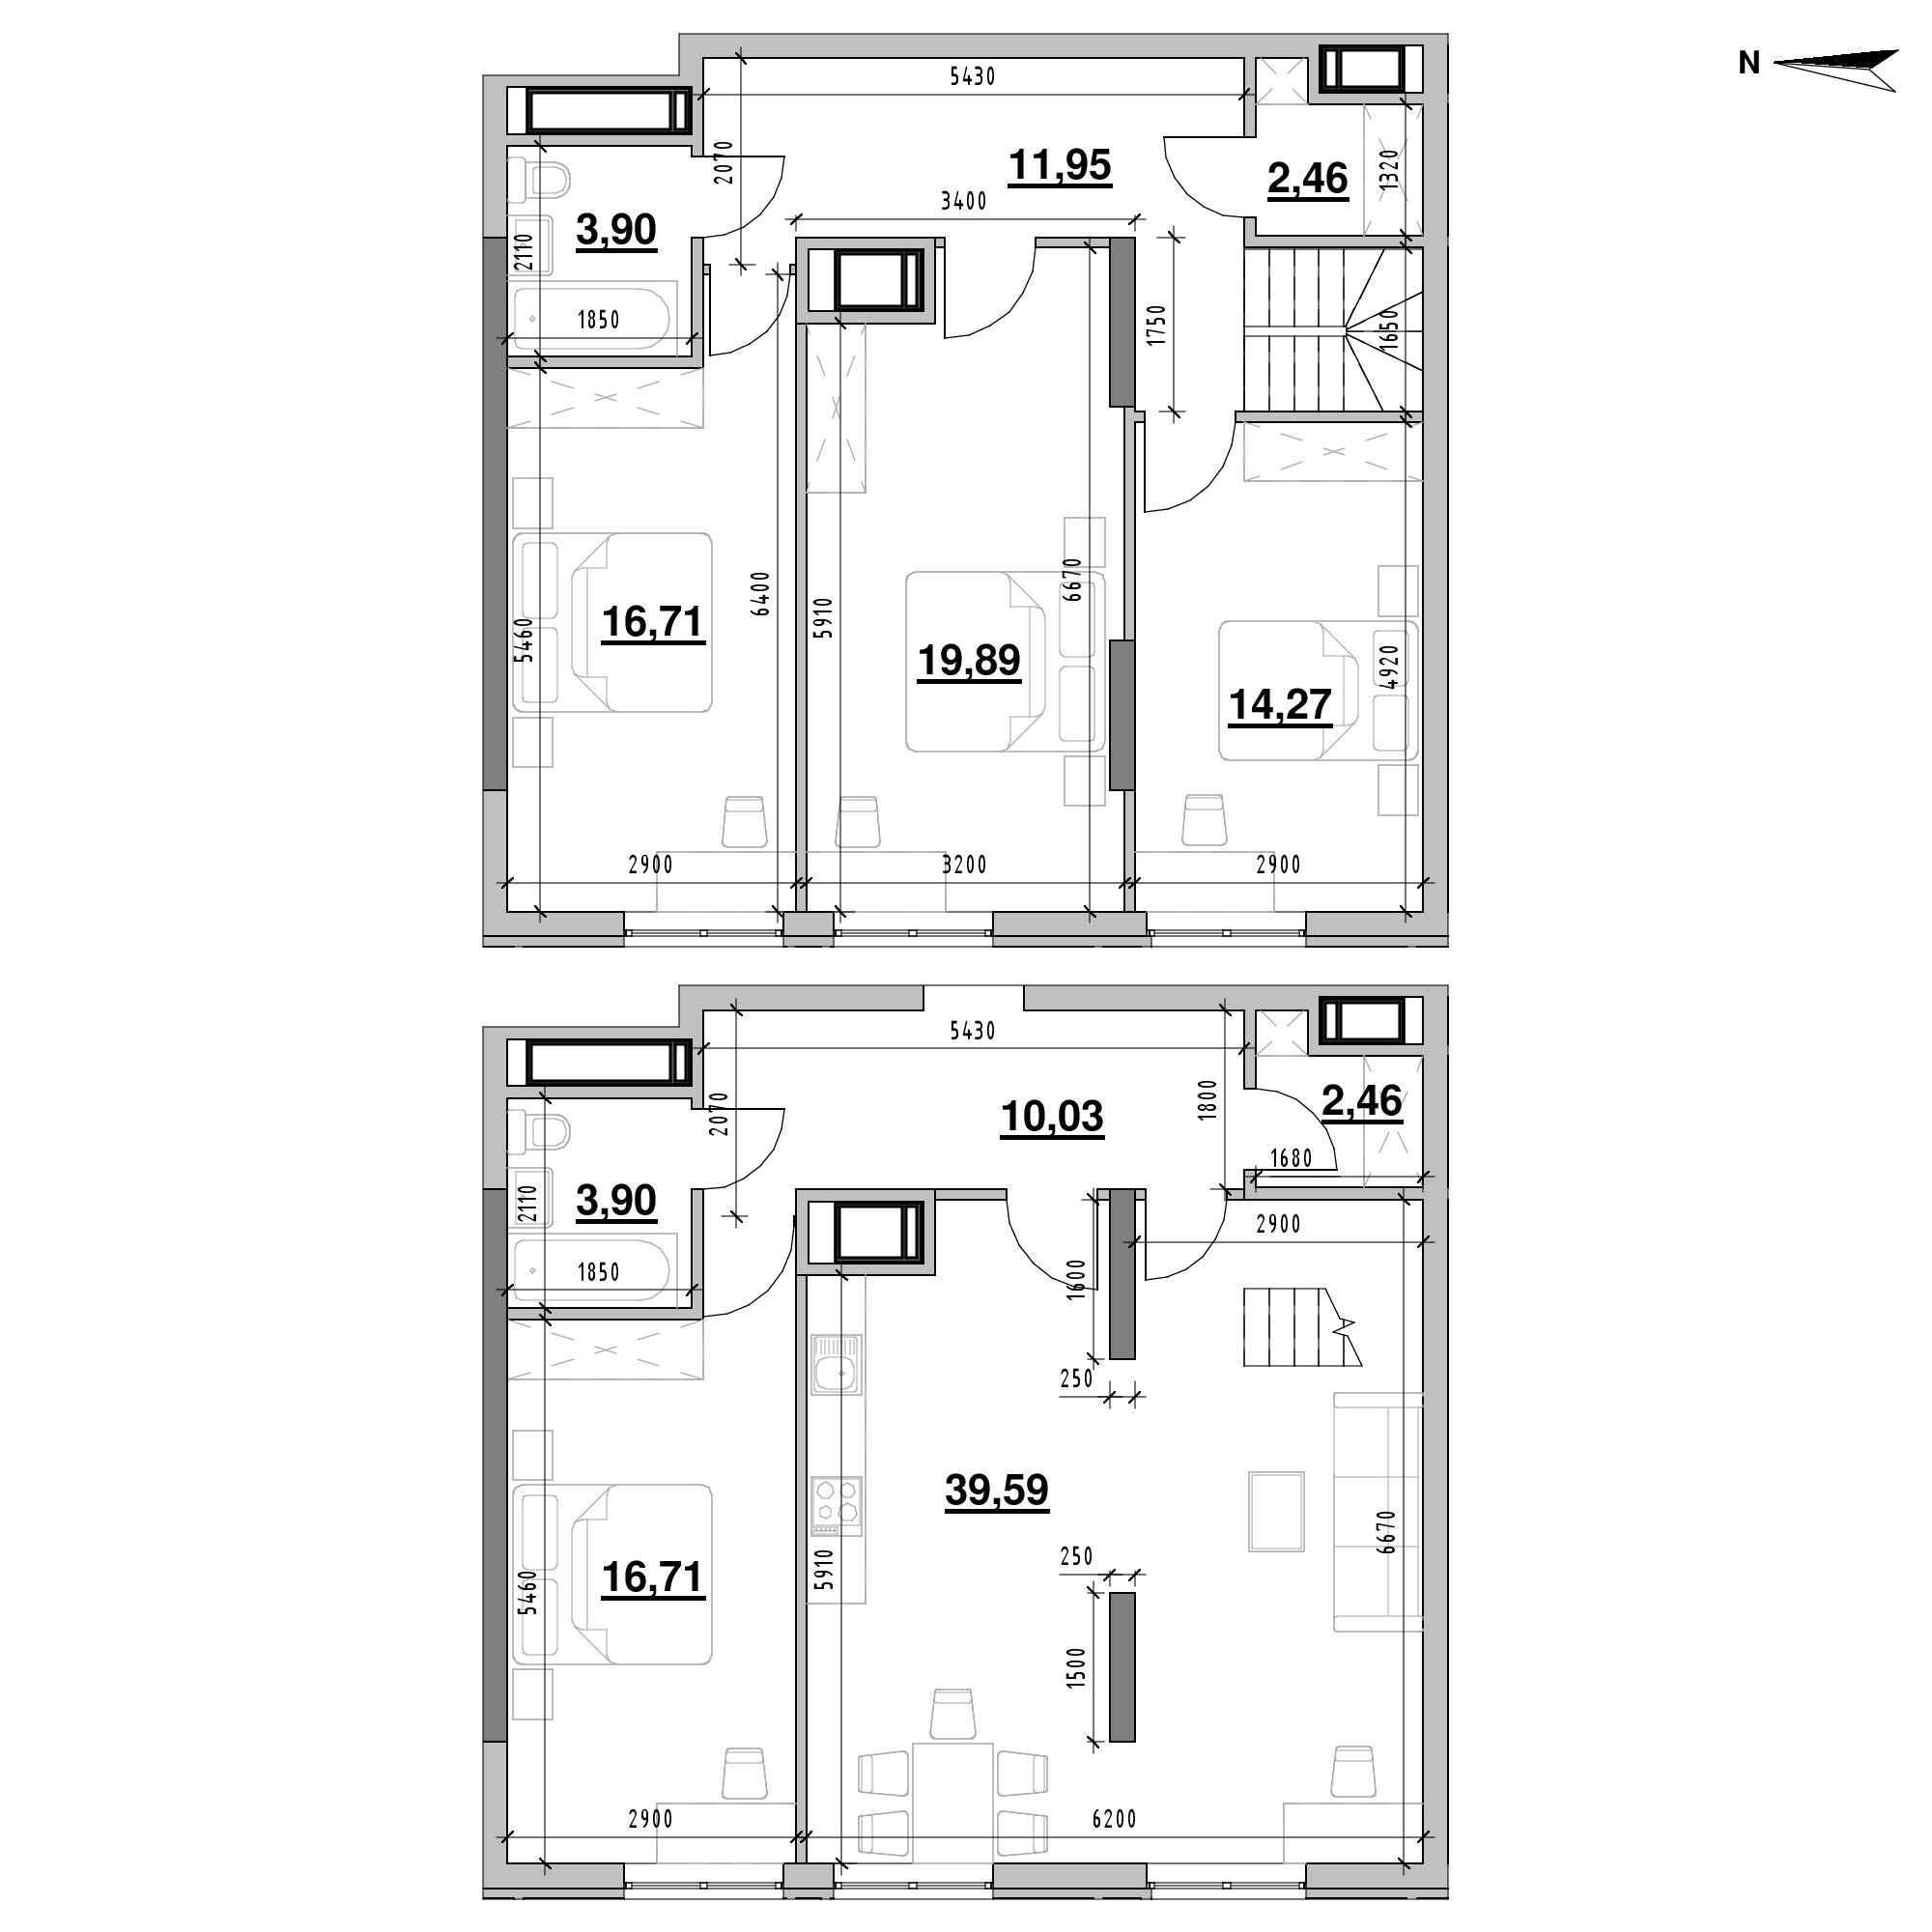 ЖК Nordica Residence: планування 4-кімнатної квартири, №212, 141.87 м<sup>2</sup>